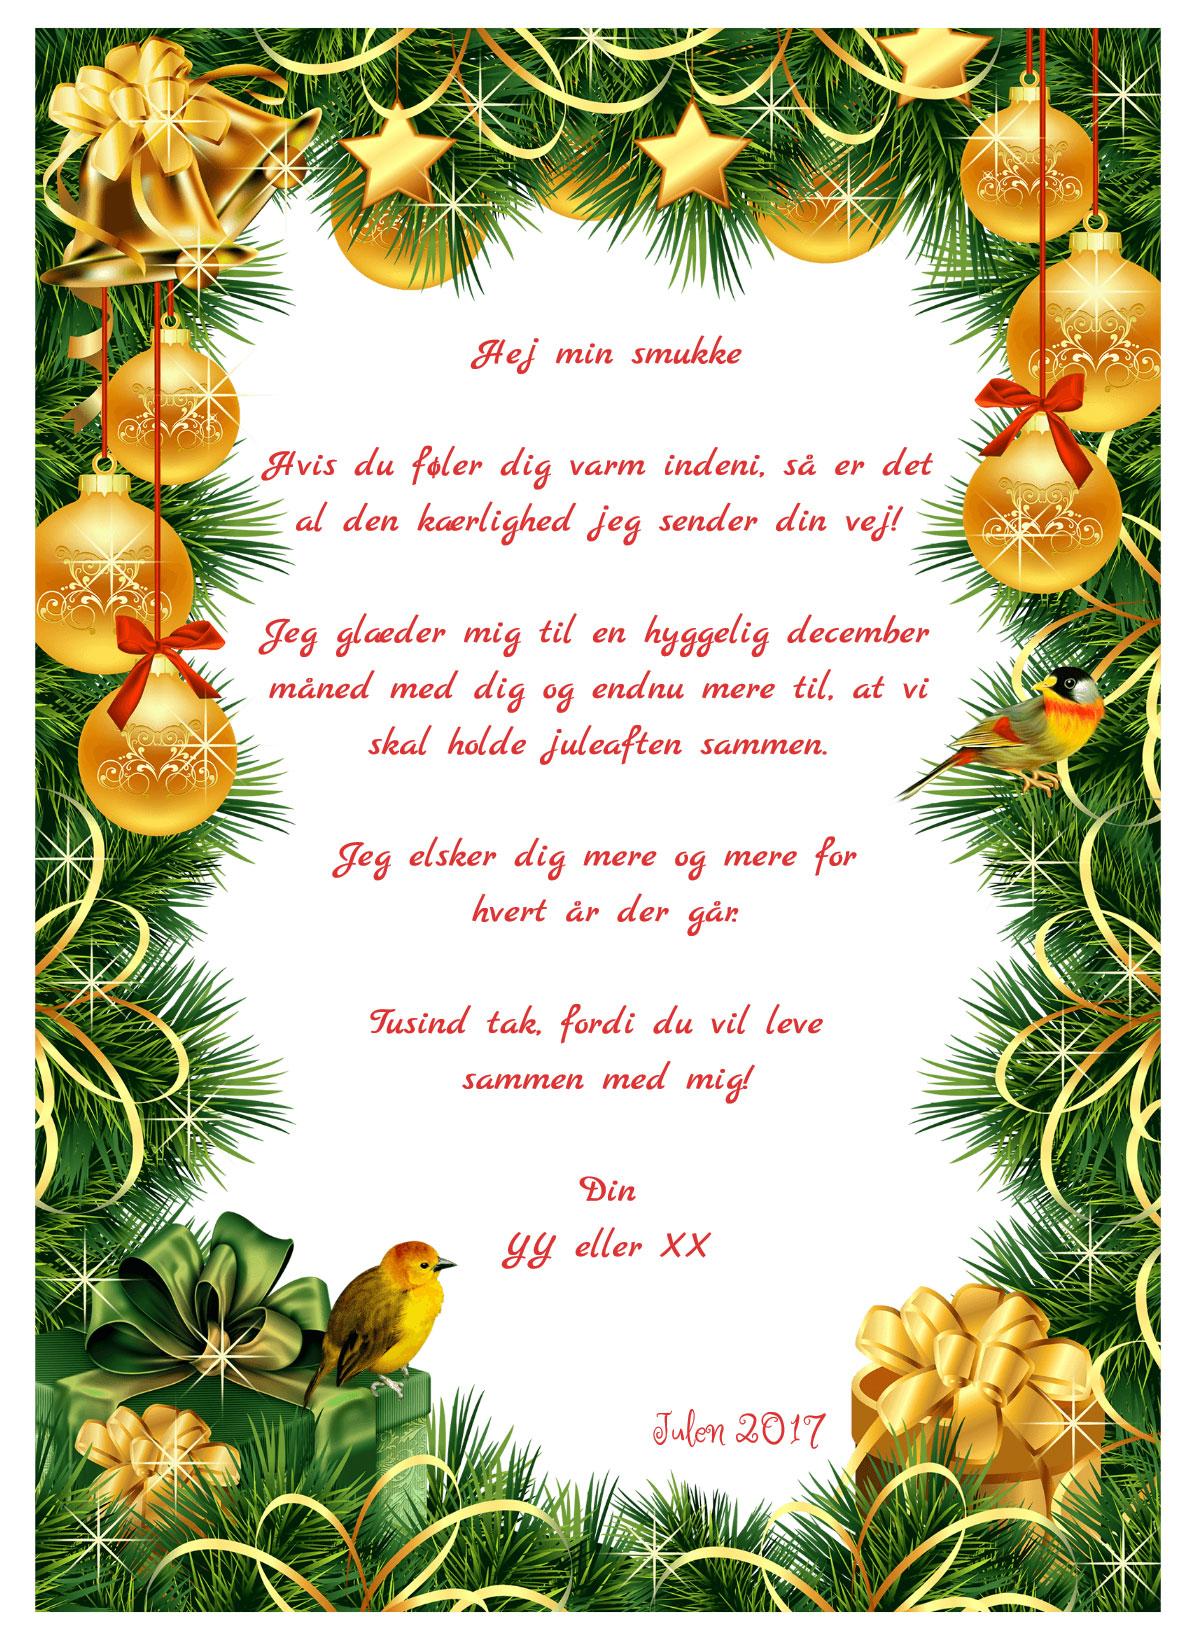 Julekort med musik og sang nr 2